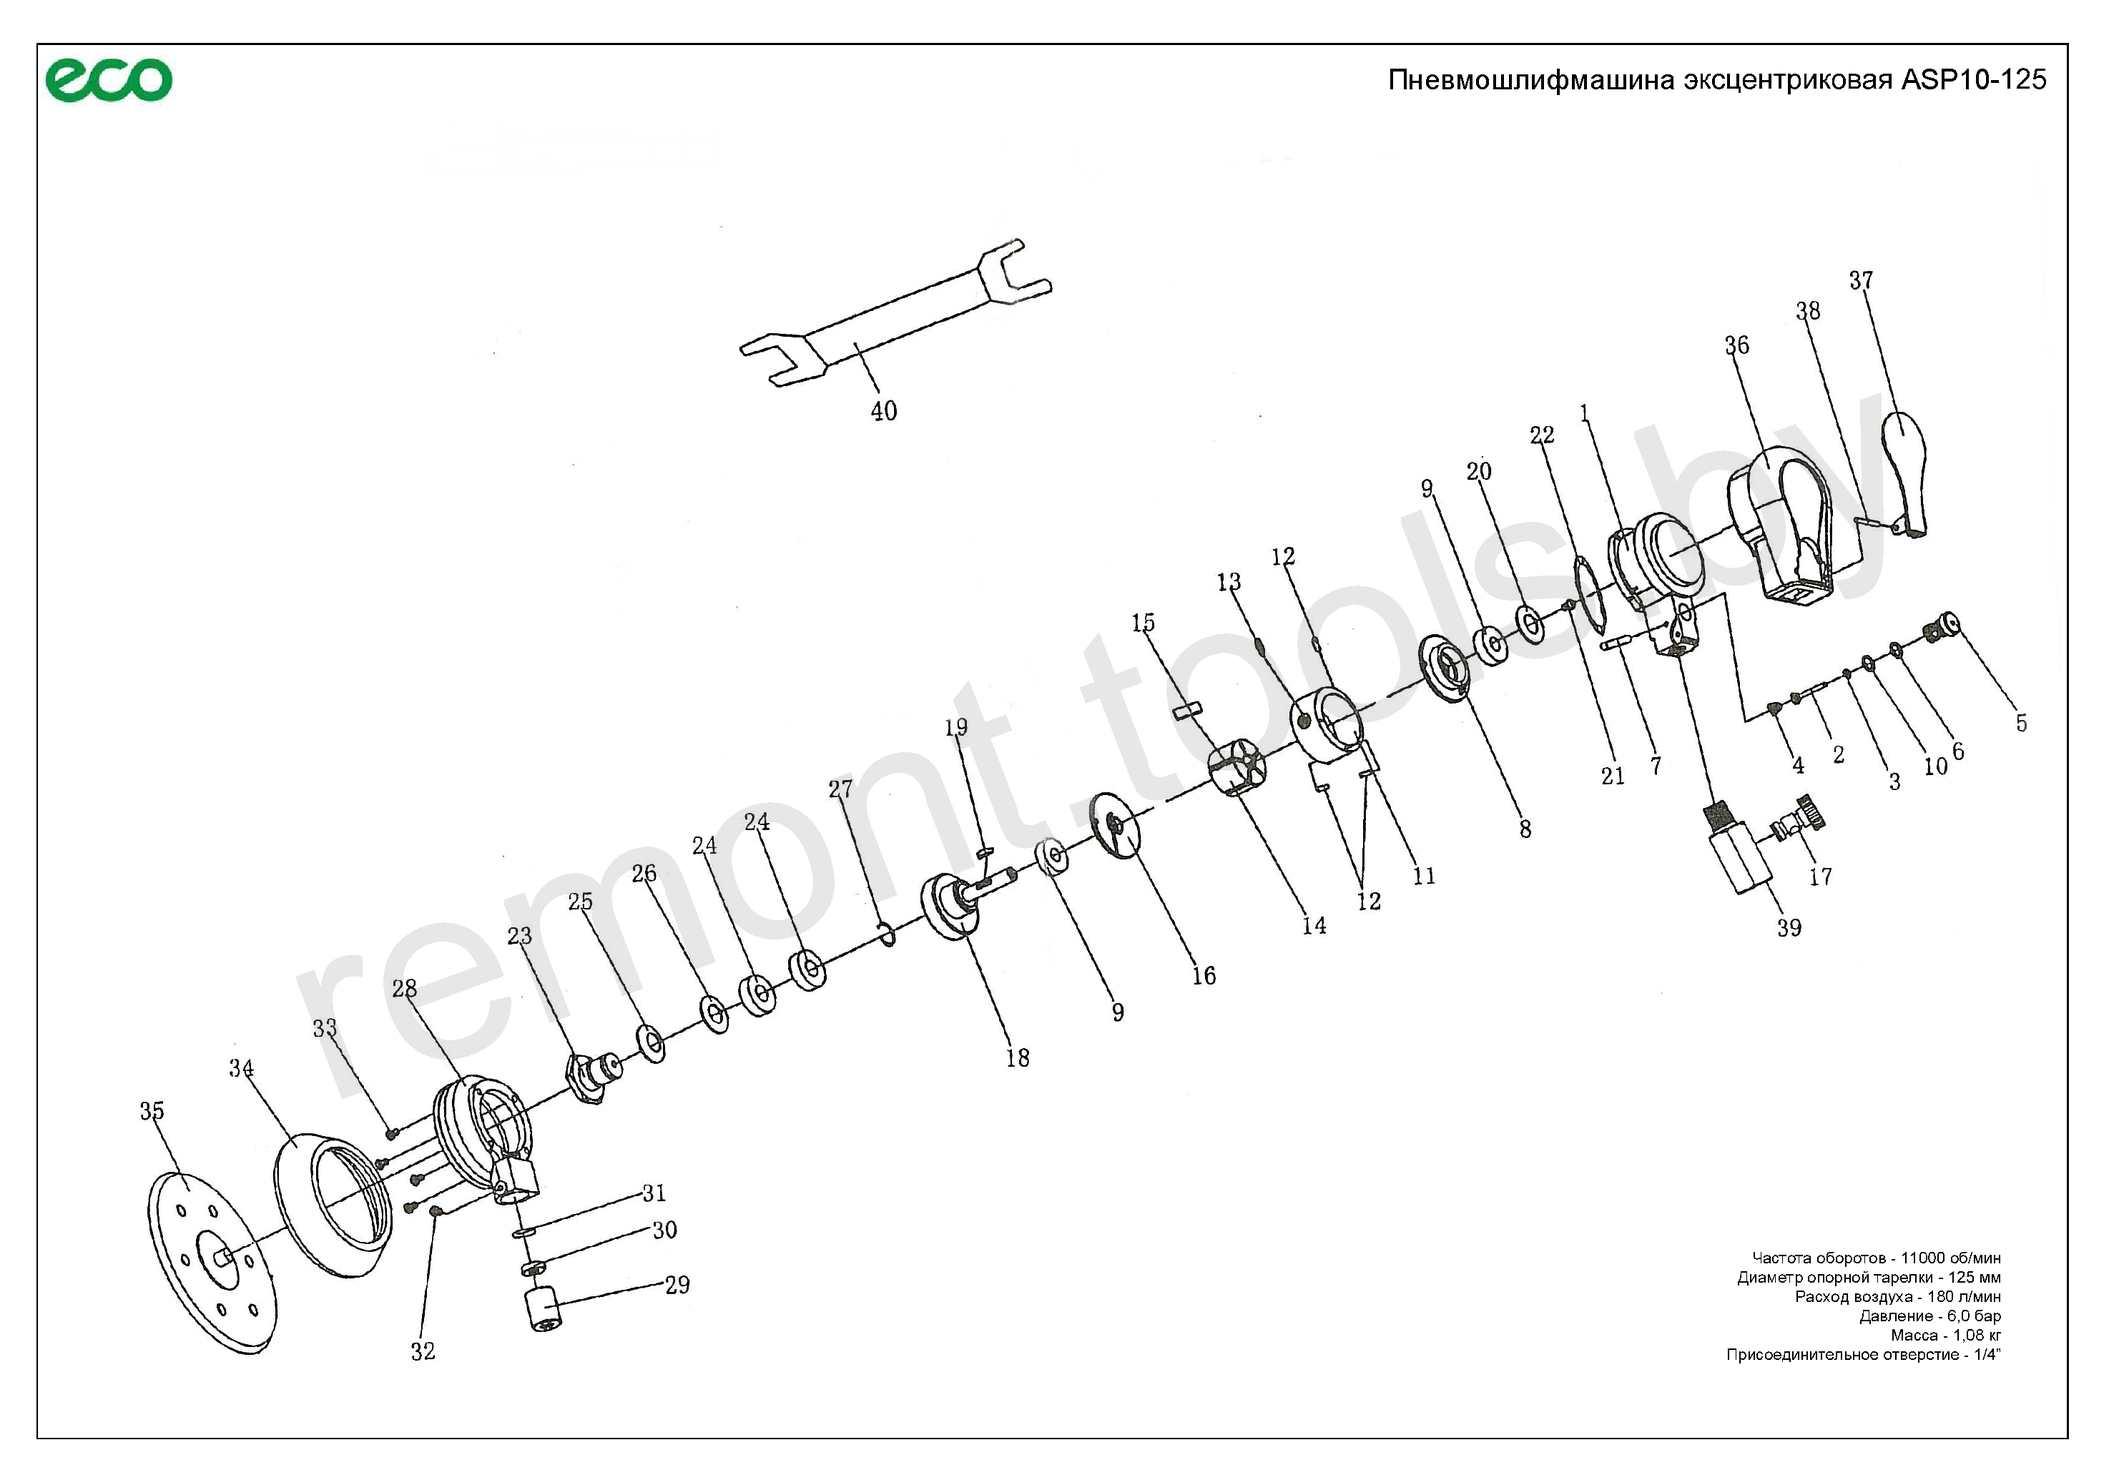 Eco Пневмошлифмашина эксцентр Asp10 125